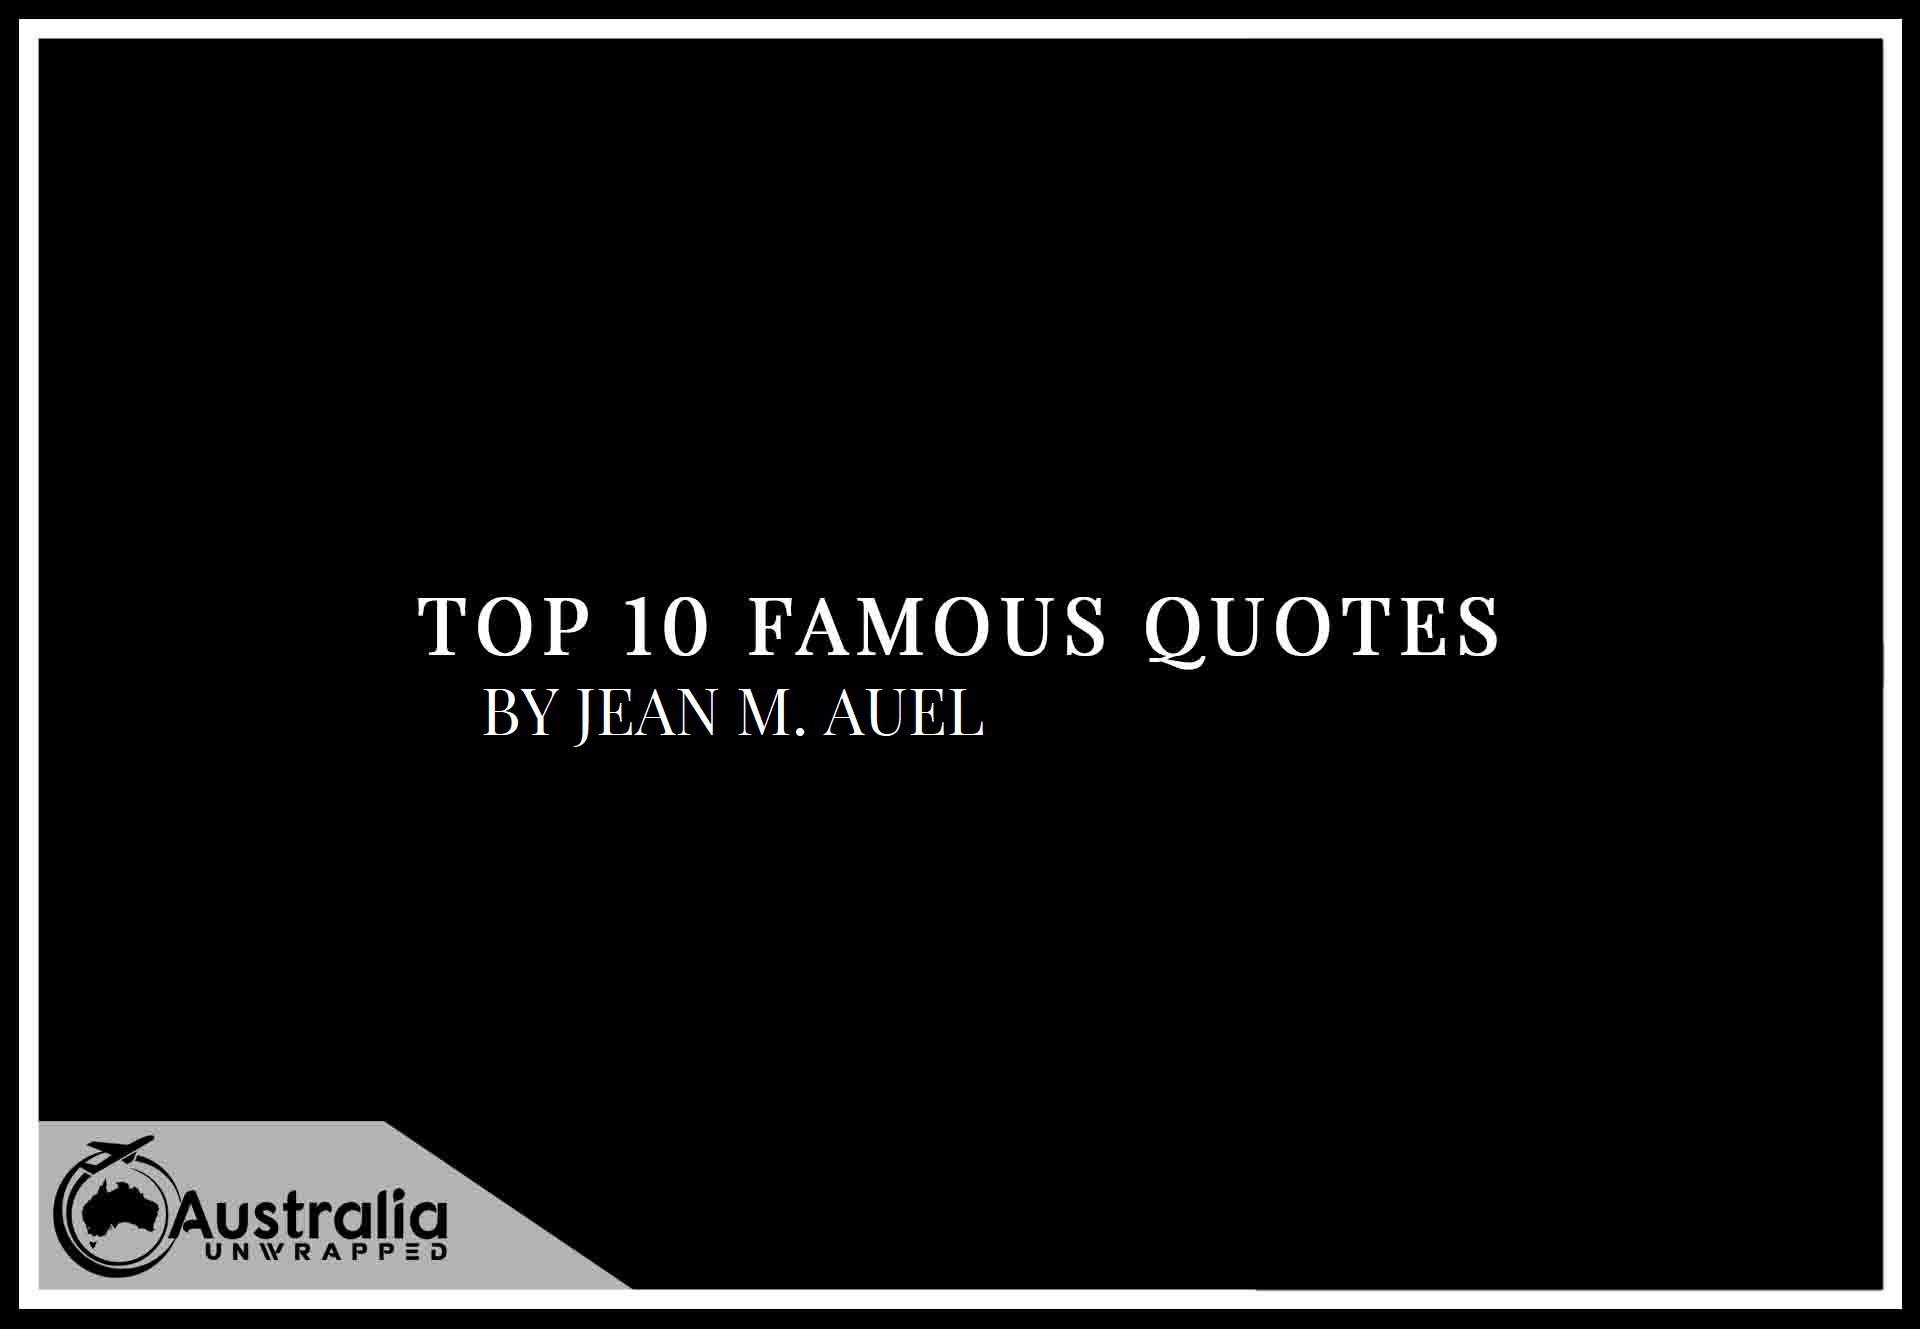 Top 10 Famous Quotes by Author Jean M. Auel